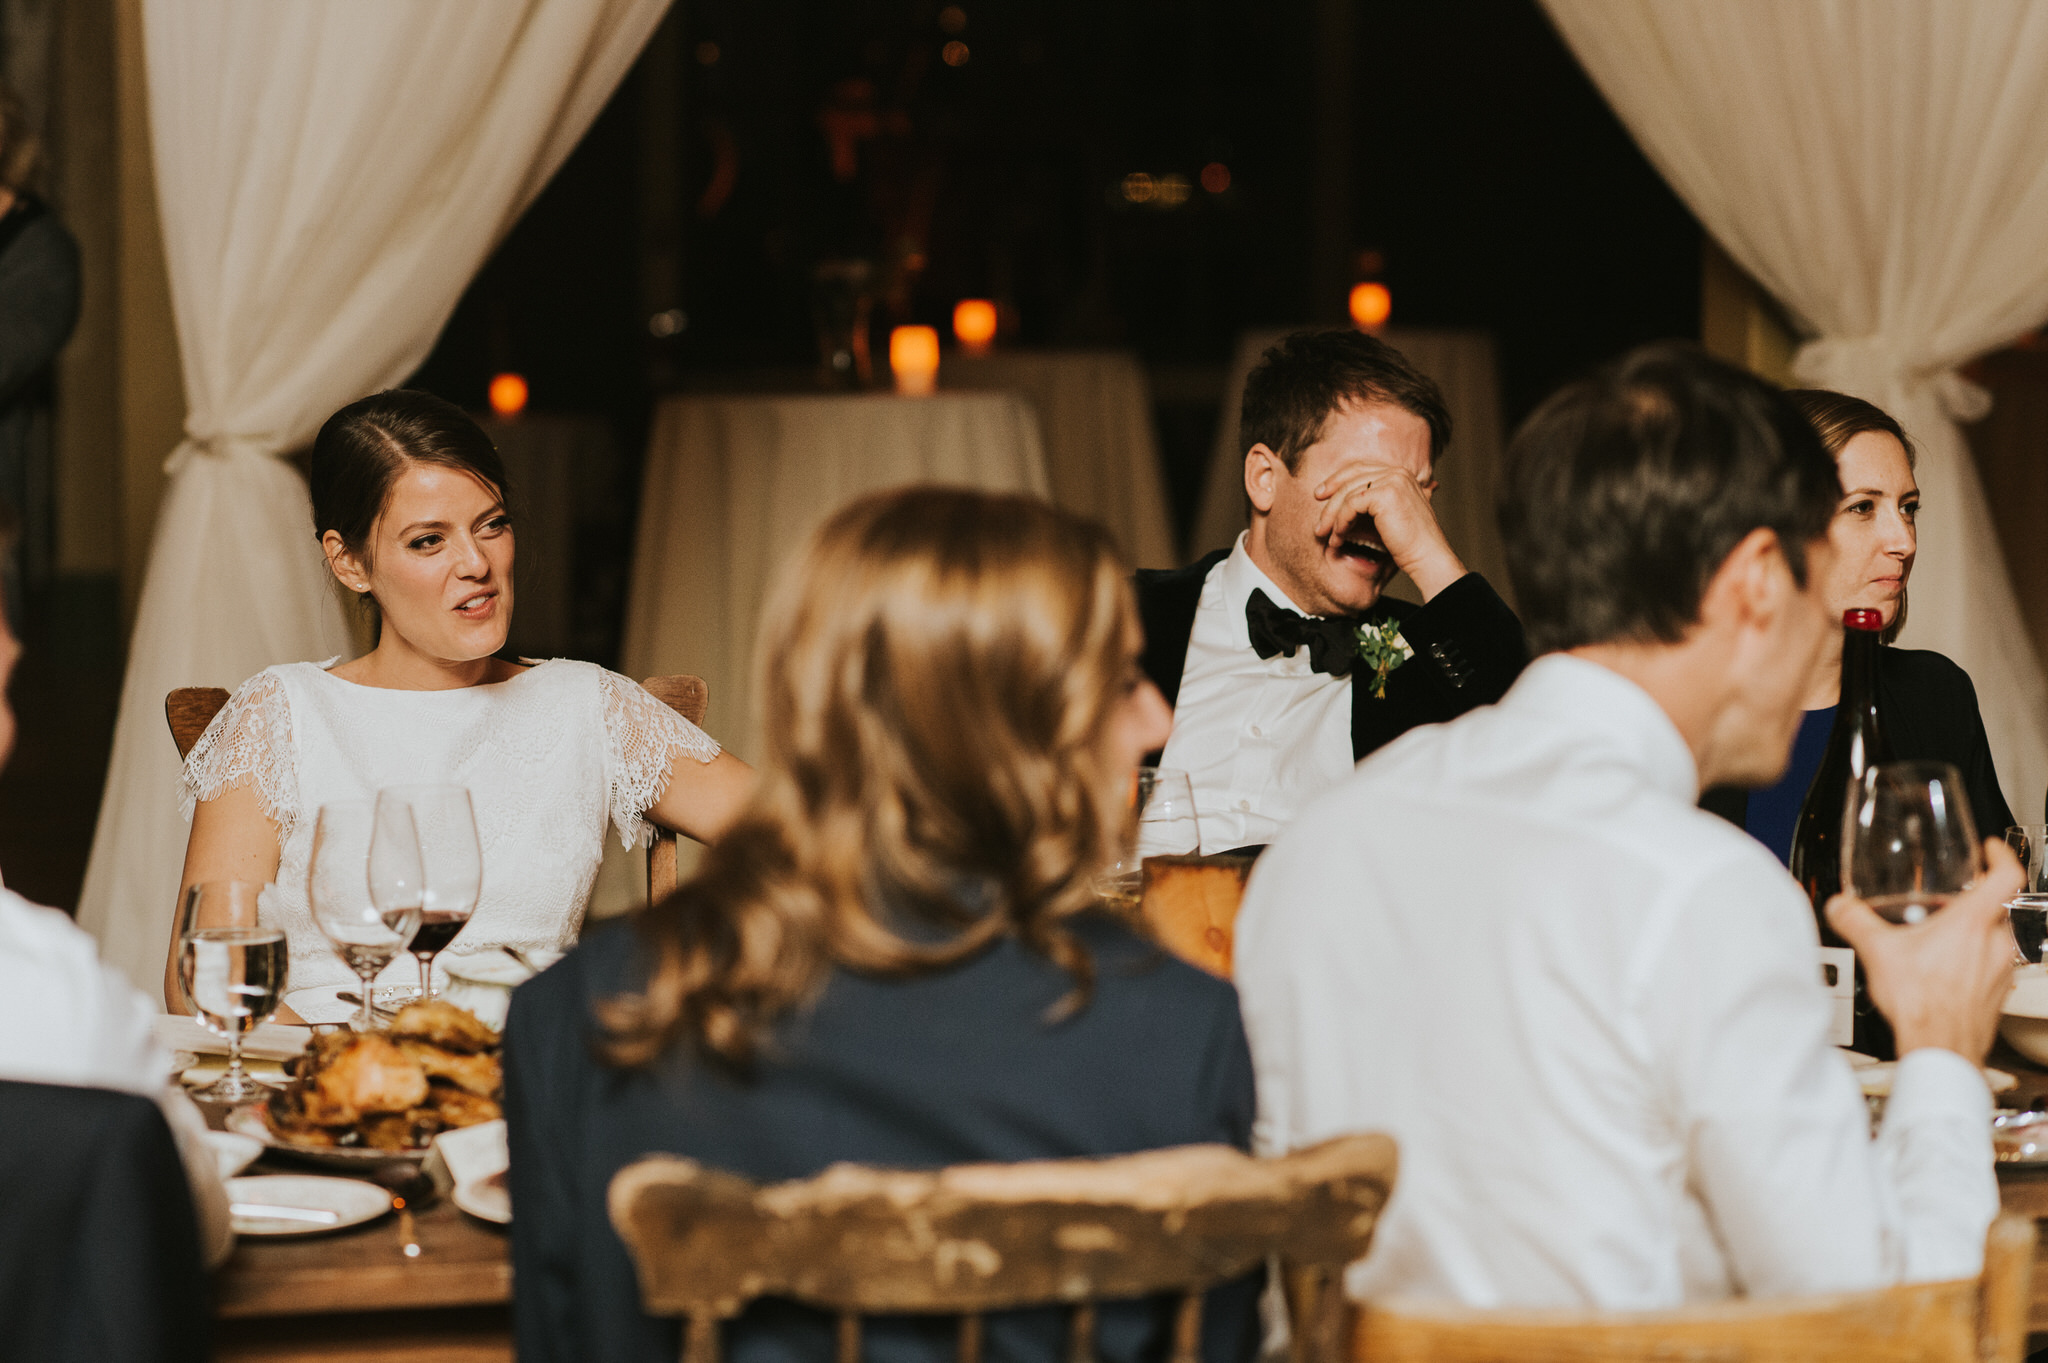 scarletoneillphotography_weddingphotography_prince edward county weddings159.JPG